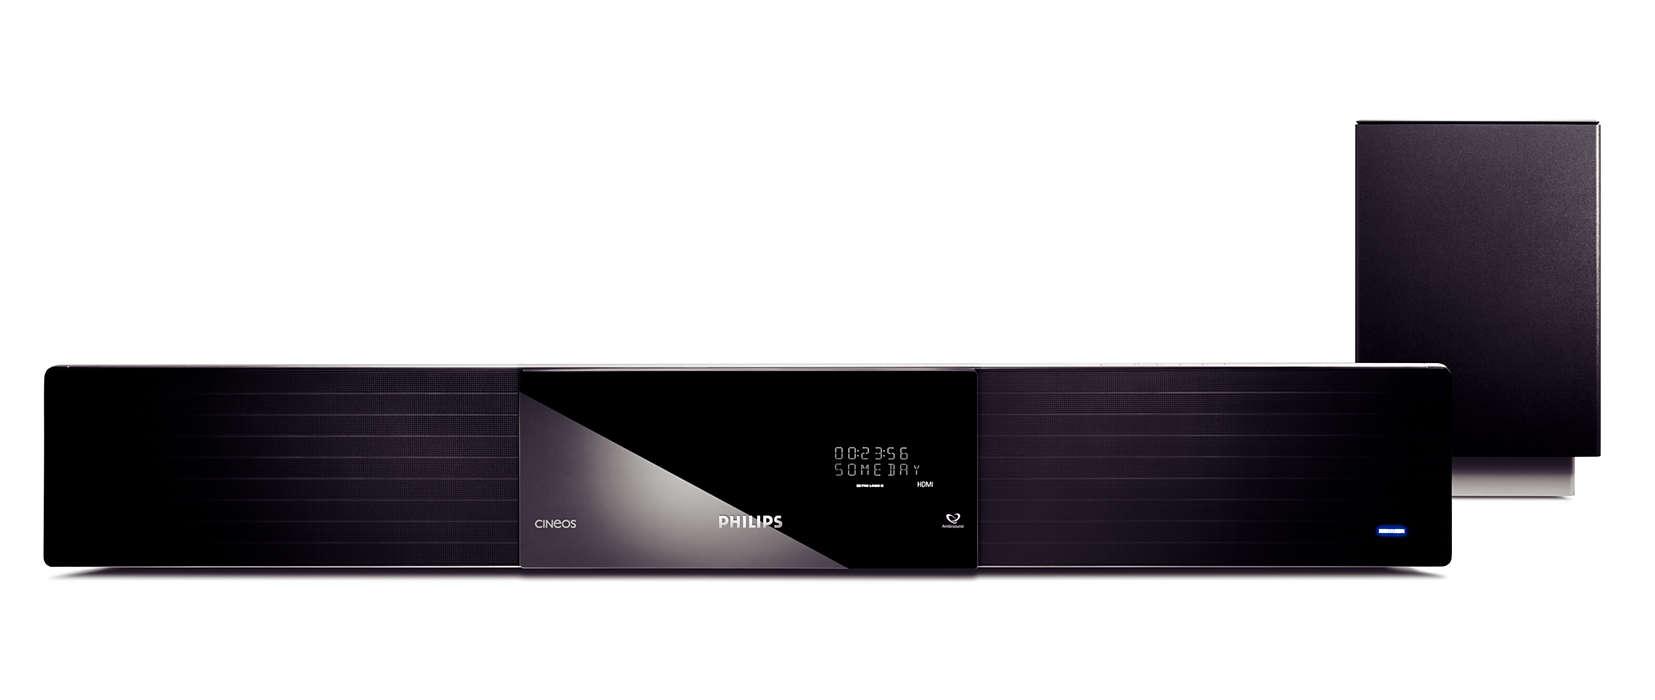 SoundBar DVD home theater HTS8100/59 | Philips